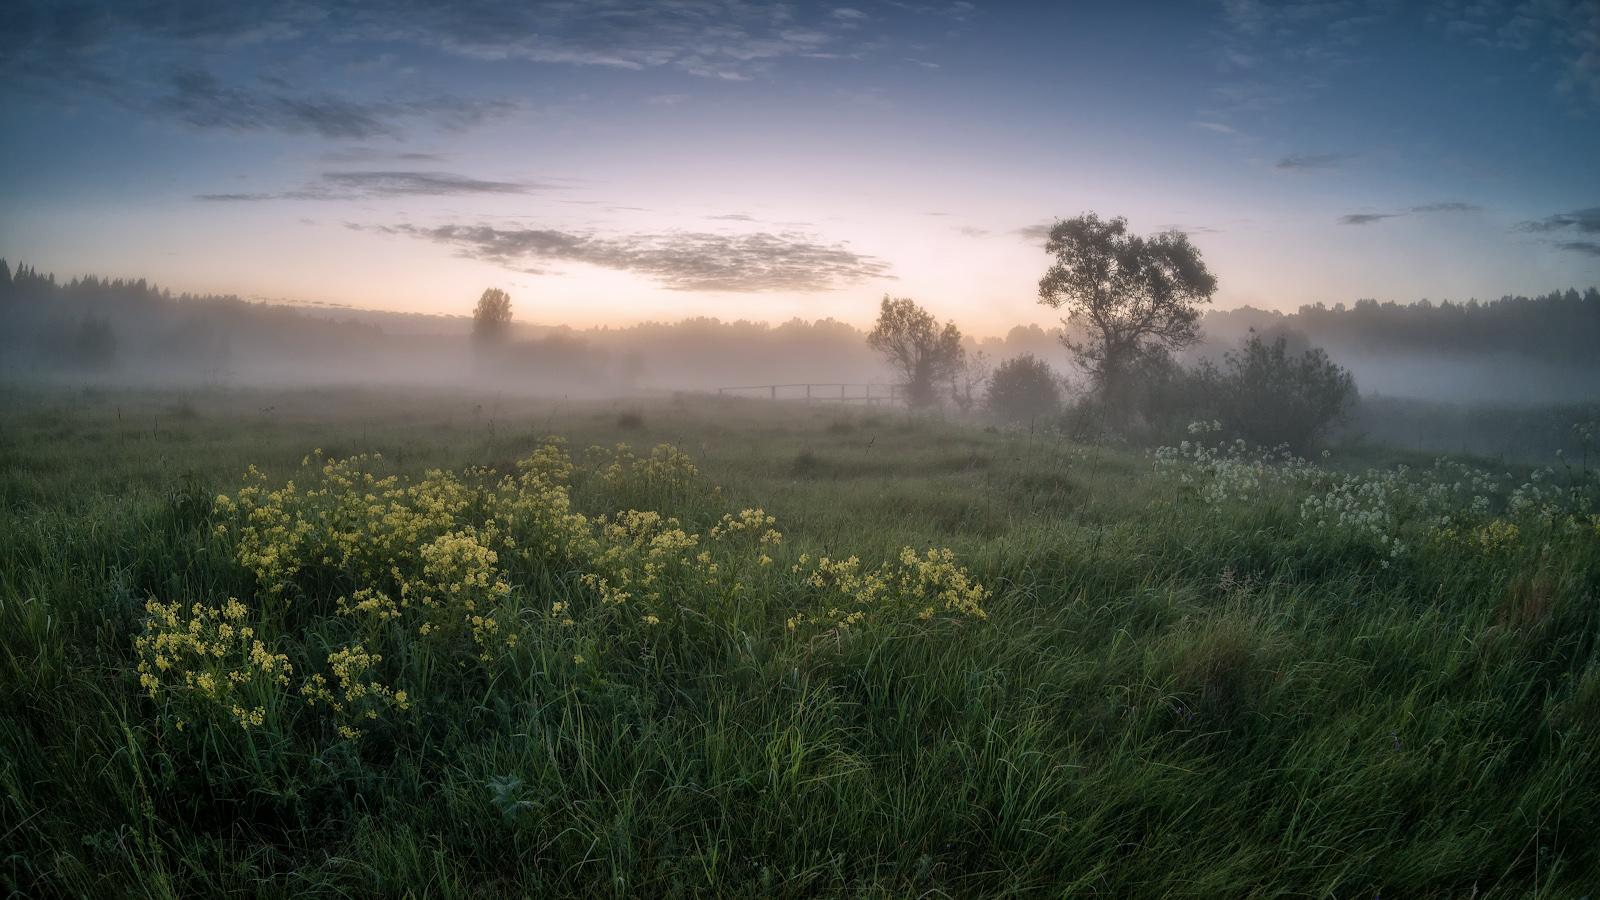 лето, июнь, утроза пол час до восхода